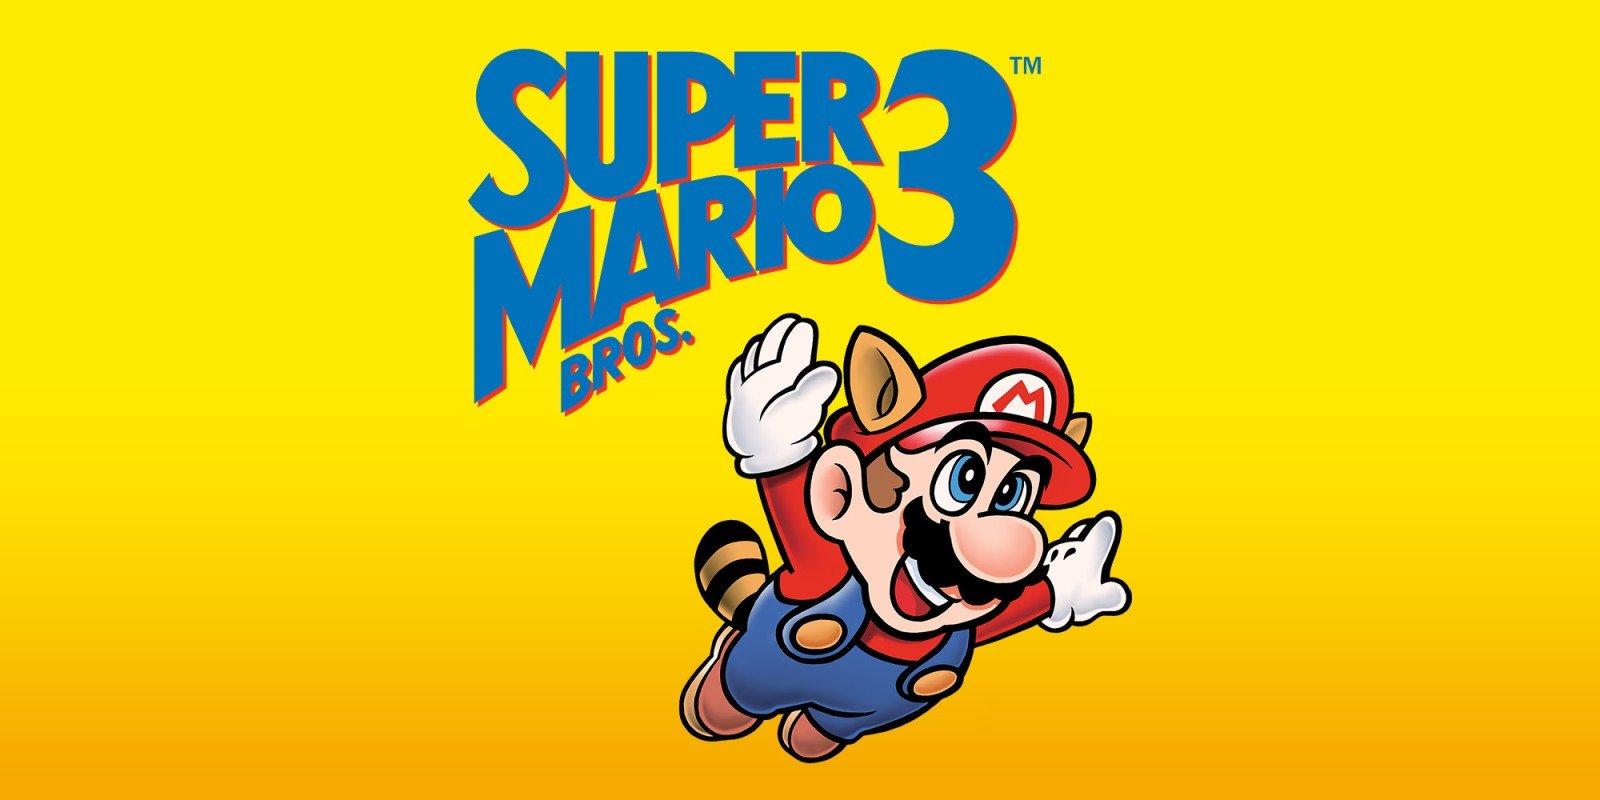 Combating Sickness With 'Super Mario Bros. 3